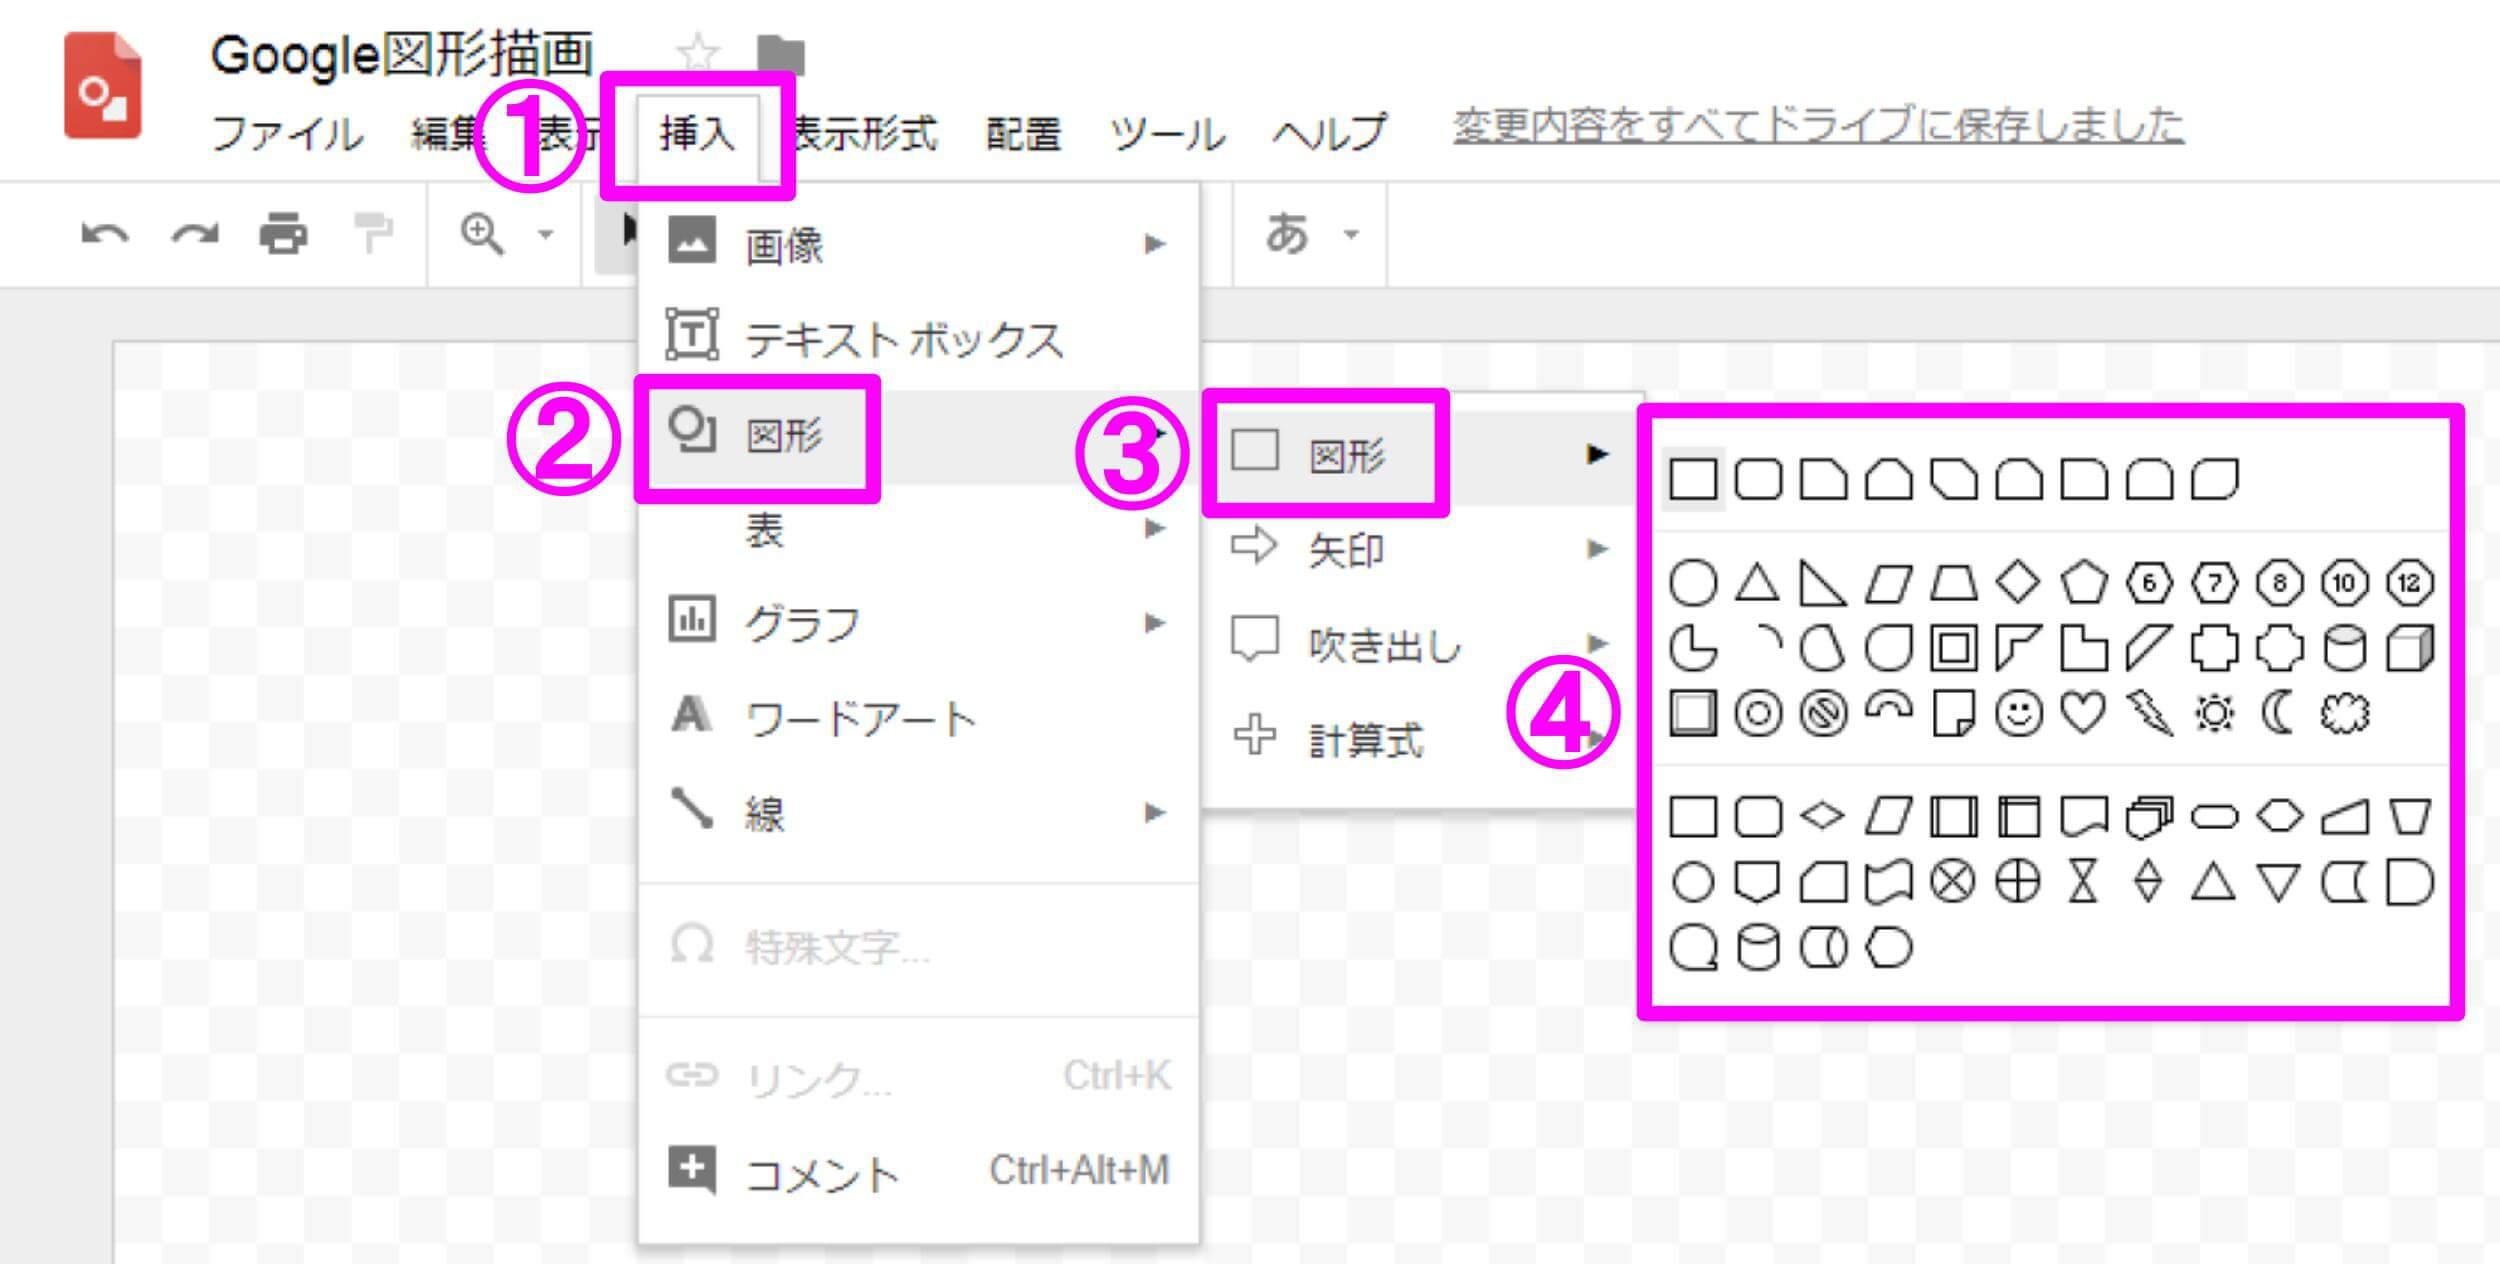 Google図形描画 図形の挿入手順